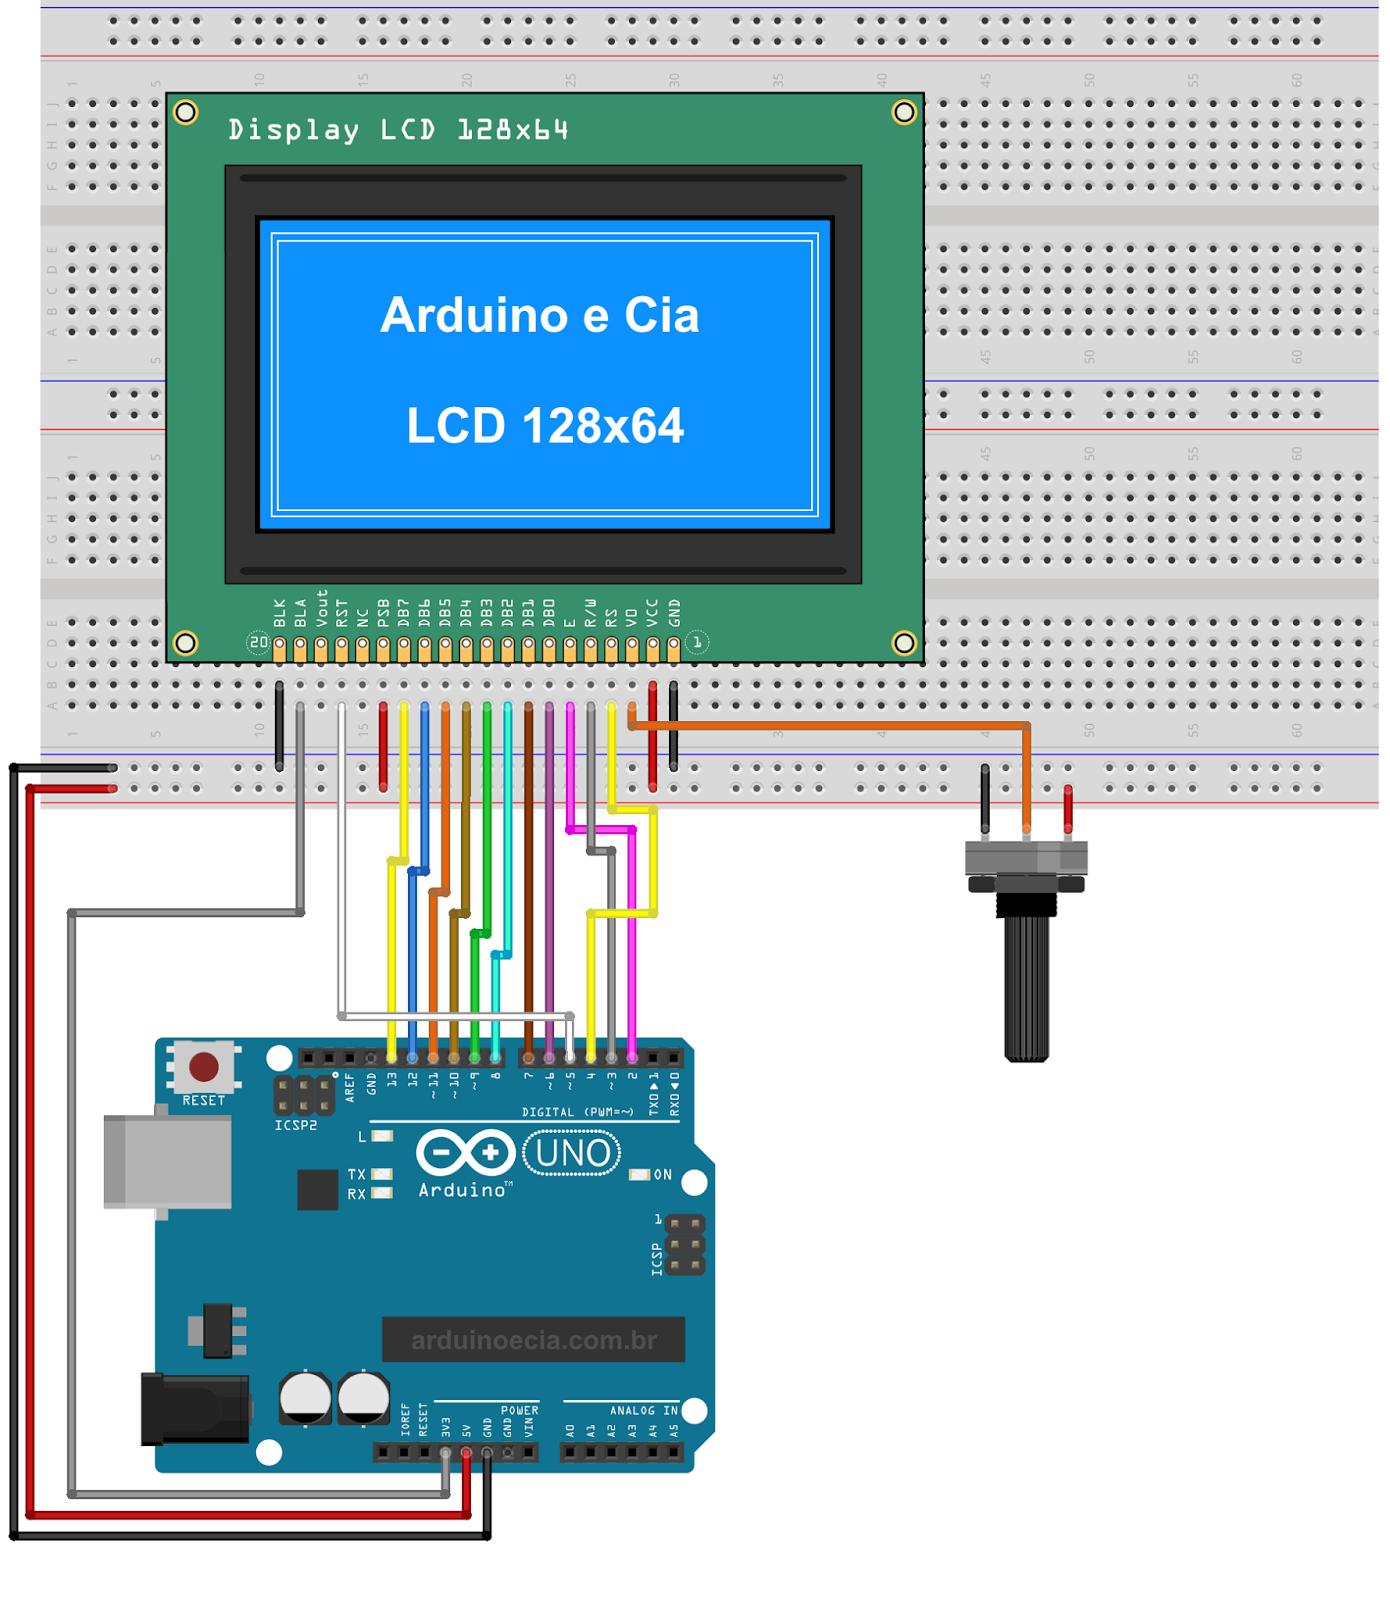 Display gráfico LCD 128x64 ST7920 em modo 8 bits (paralelo